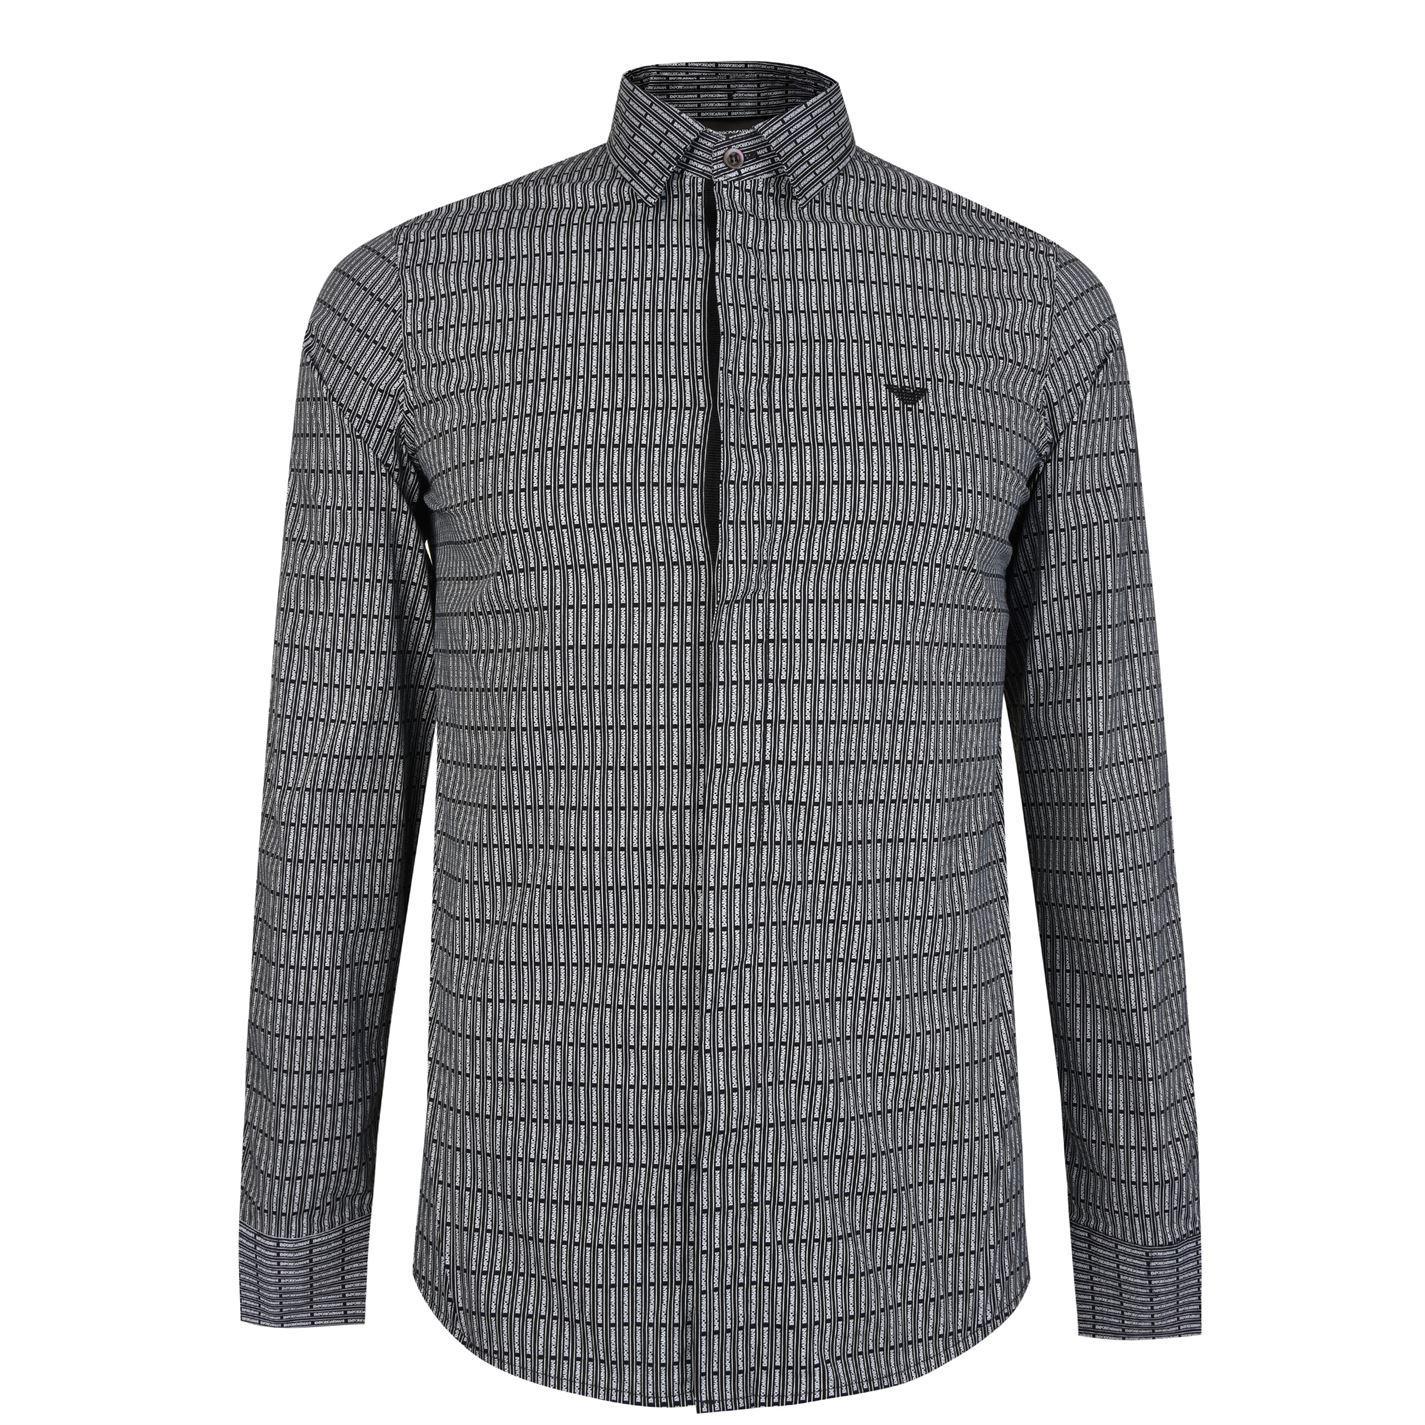 Lyst Emporio Armani Detachable Collar Logo Shirt In Black For Men